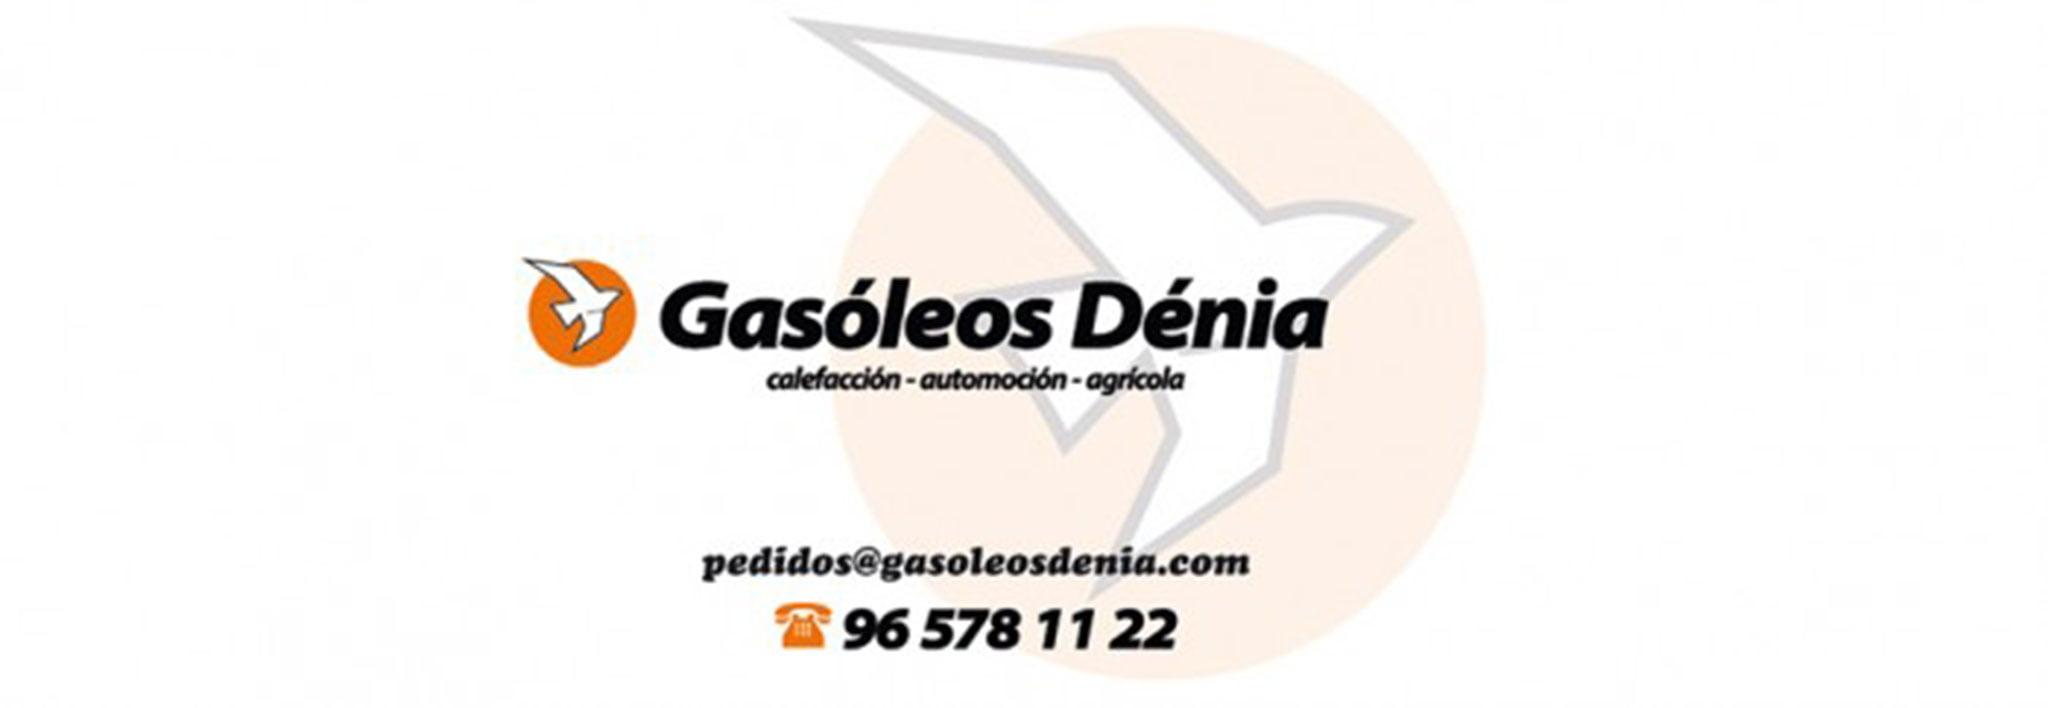 Logotipo de Gasóleos Dénia